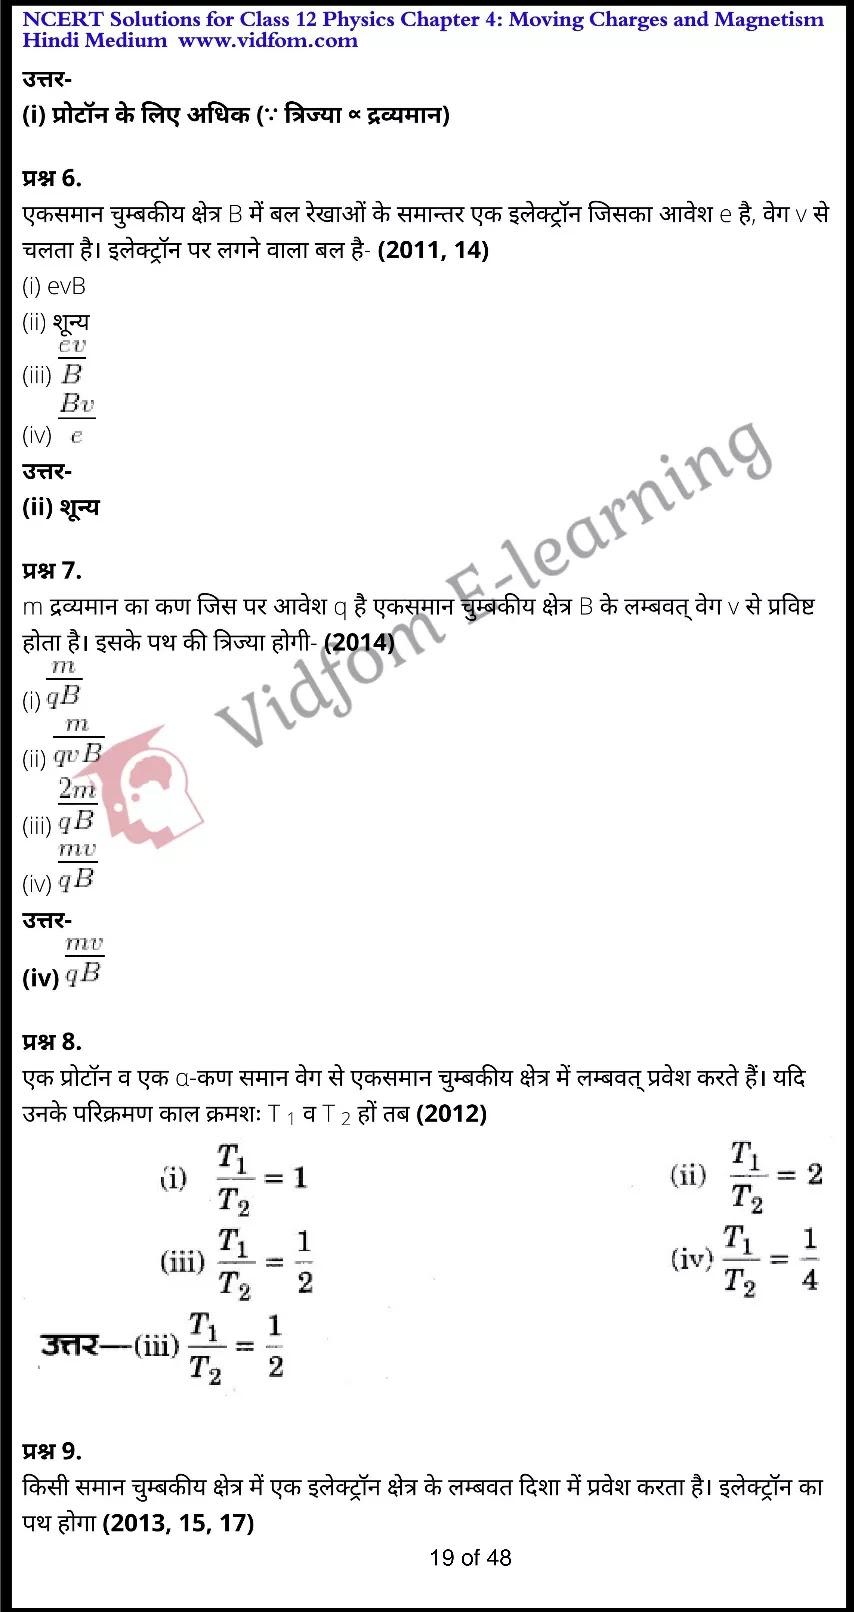 class 12 physics chapter 4 light hindi medium 19